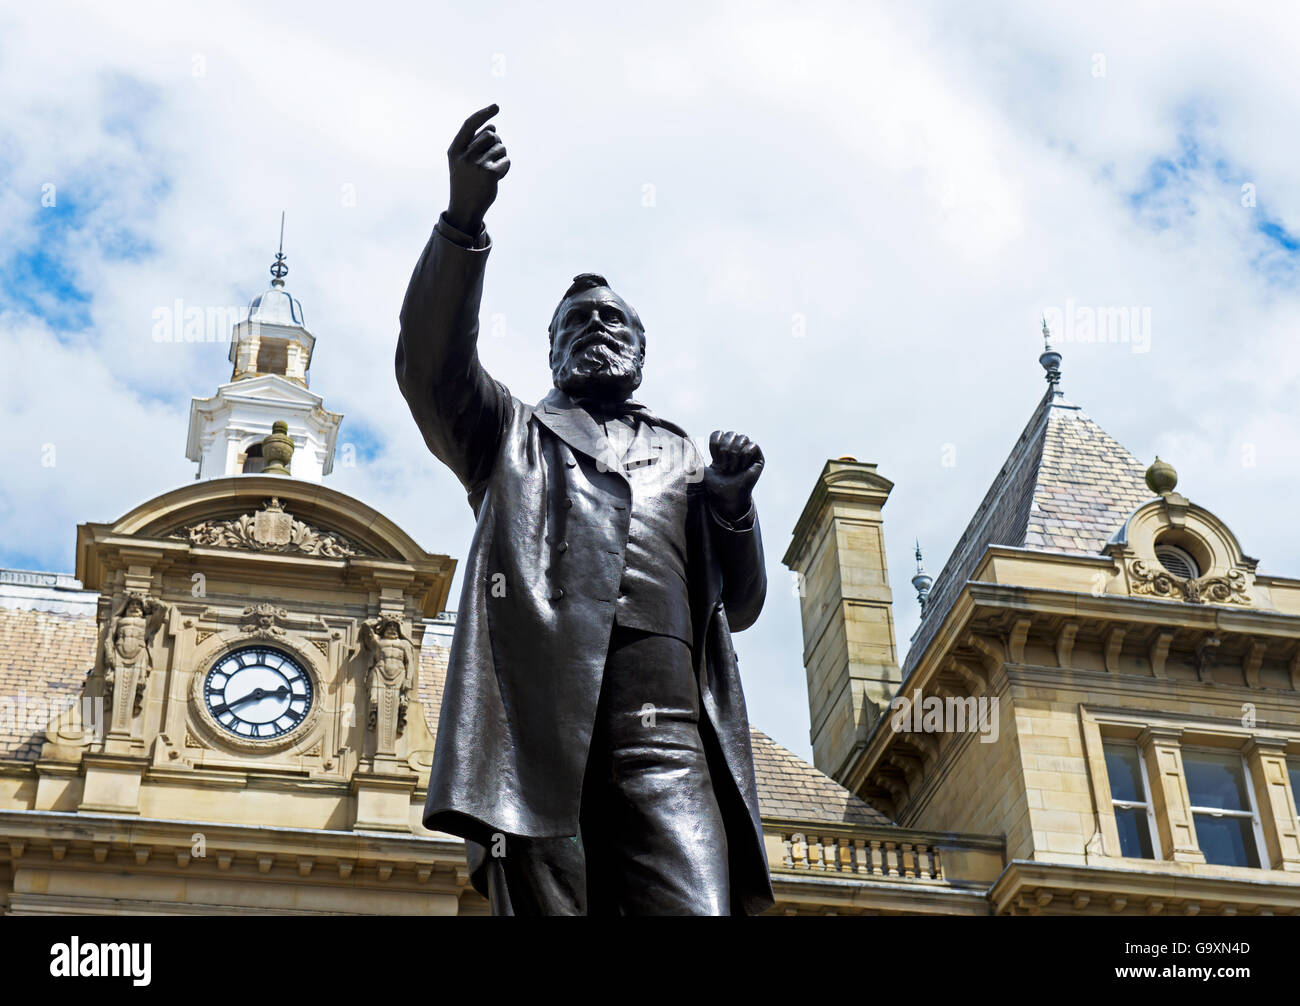 Statue of W E Forster, Bradford, West Yorkshire, England UK - Stock Image